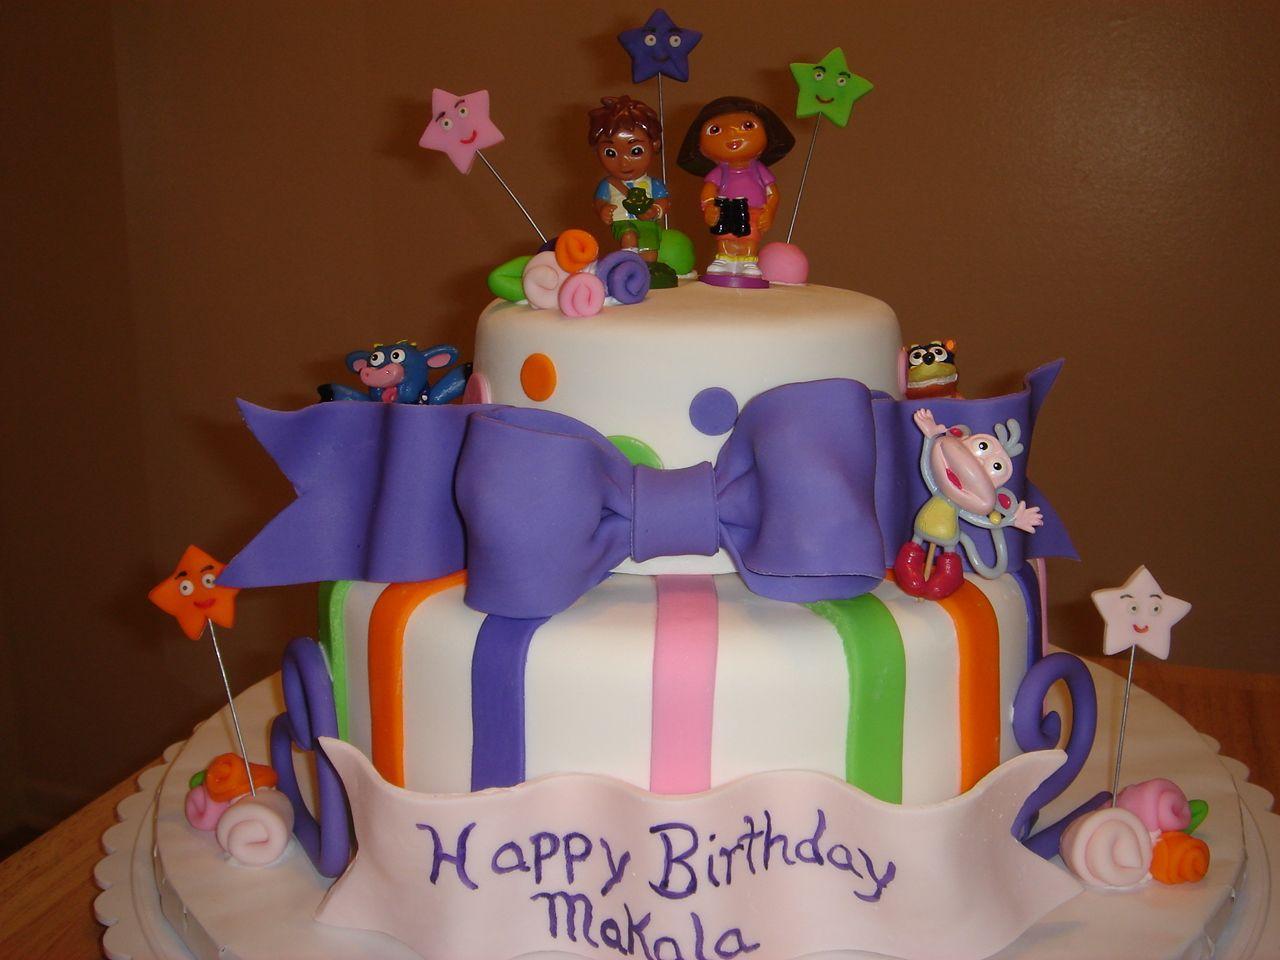 dora birthday cakes for girls Makalas Dora Birthday Cake Dora